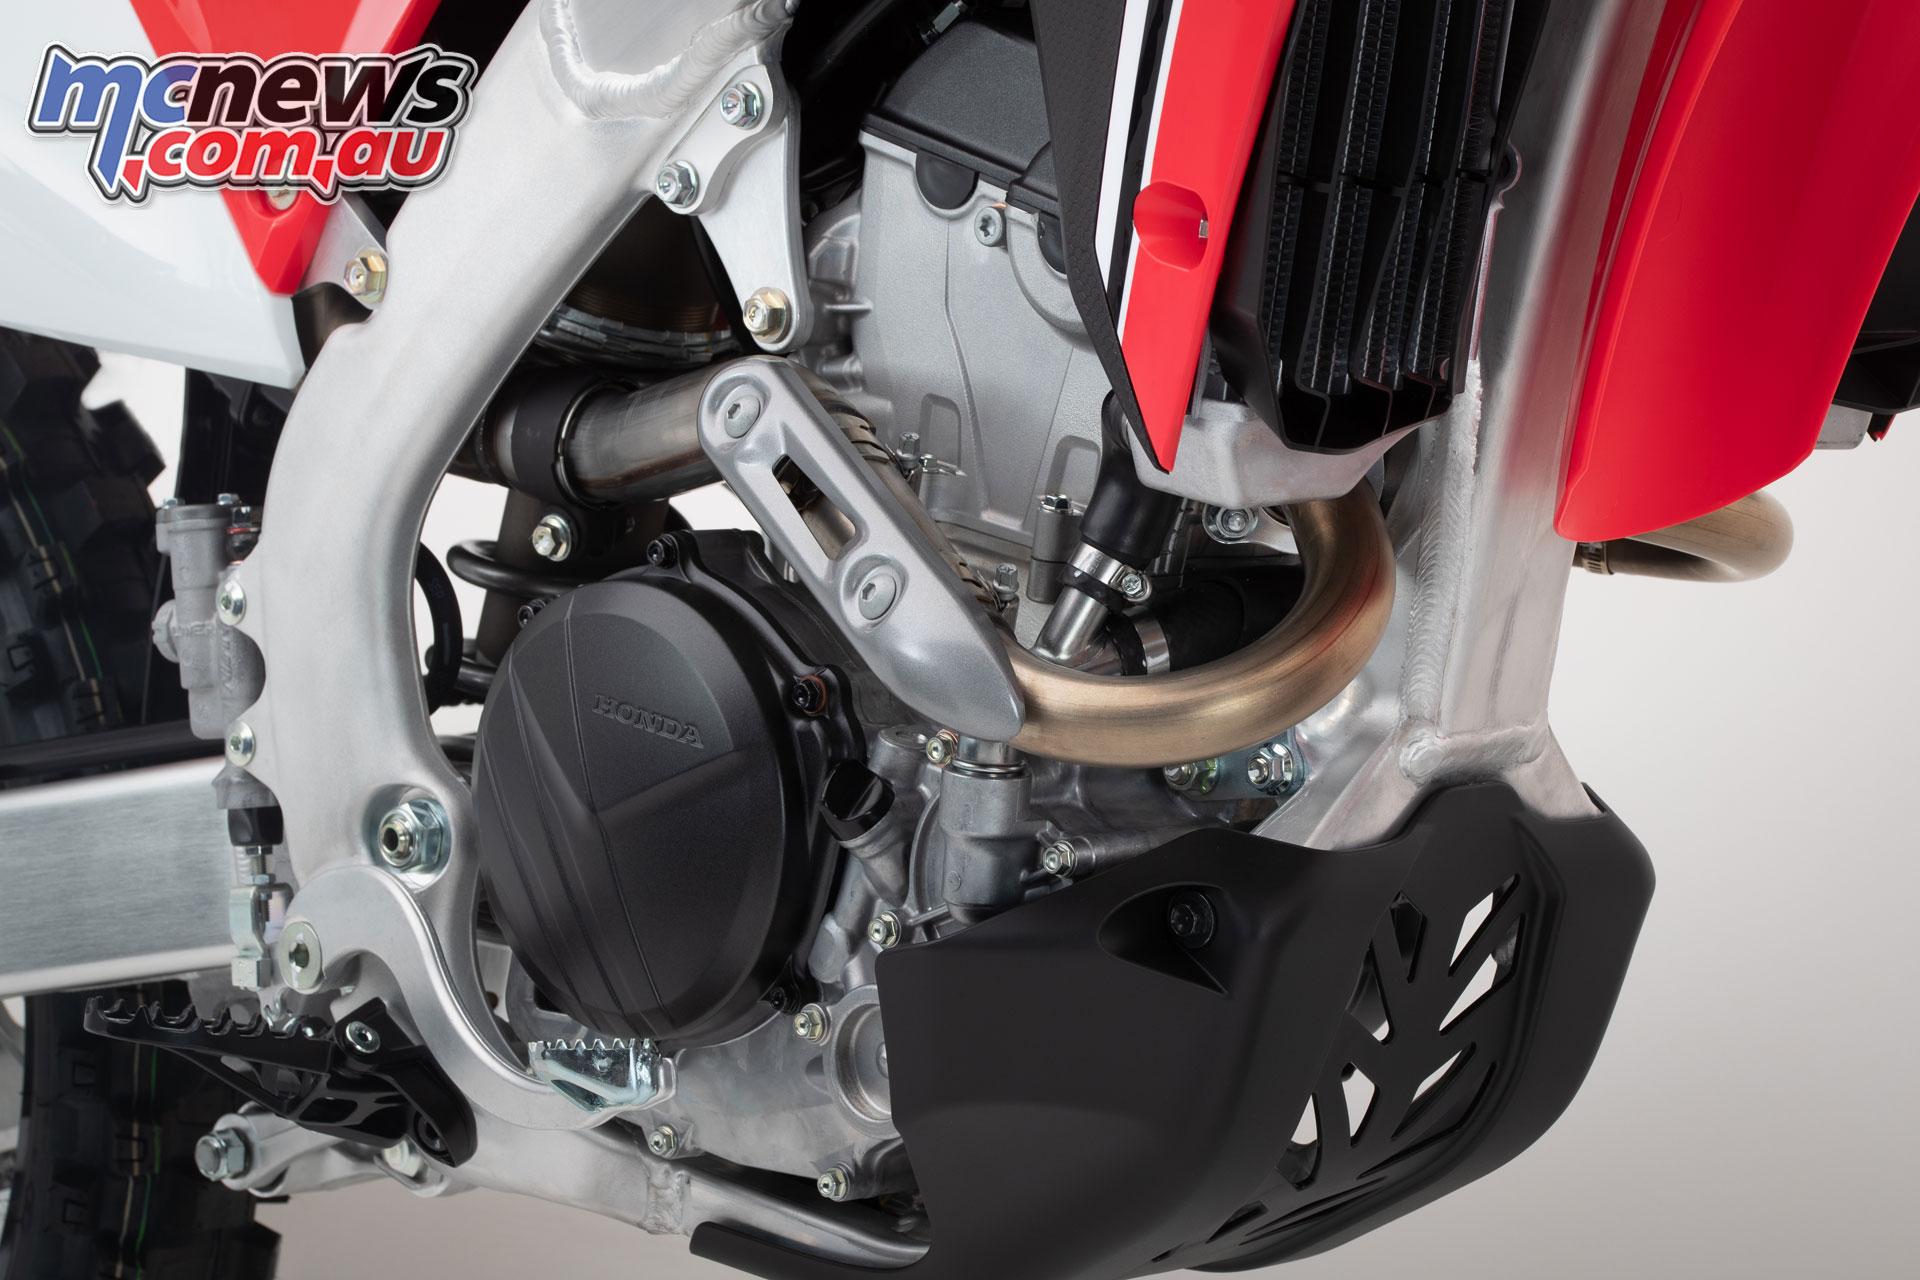 Honda CRFR engine R